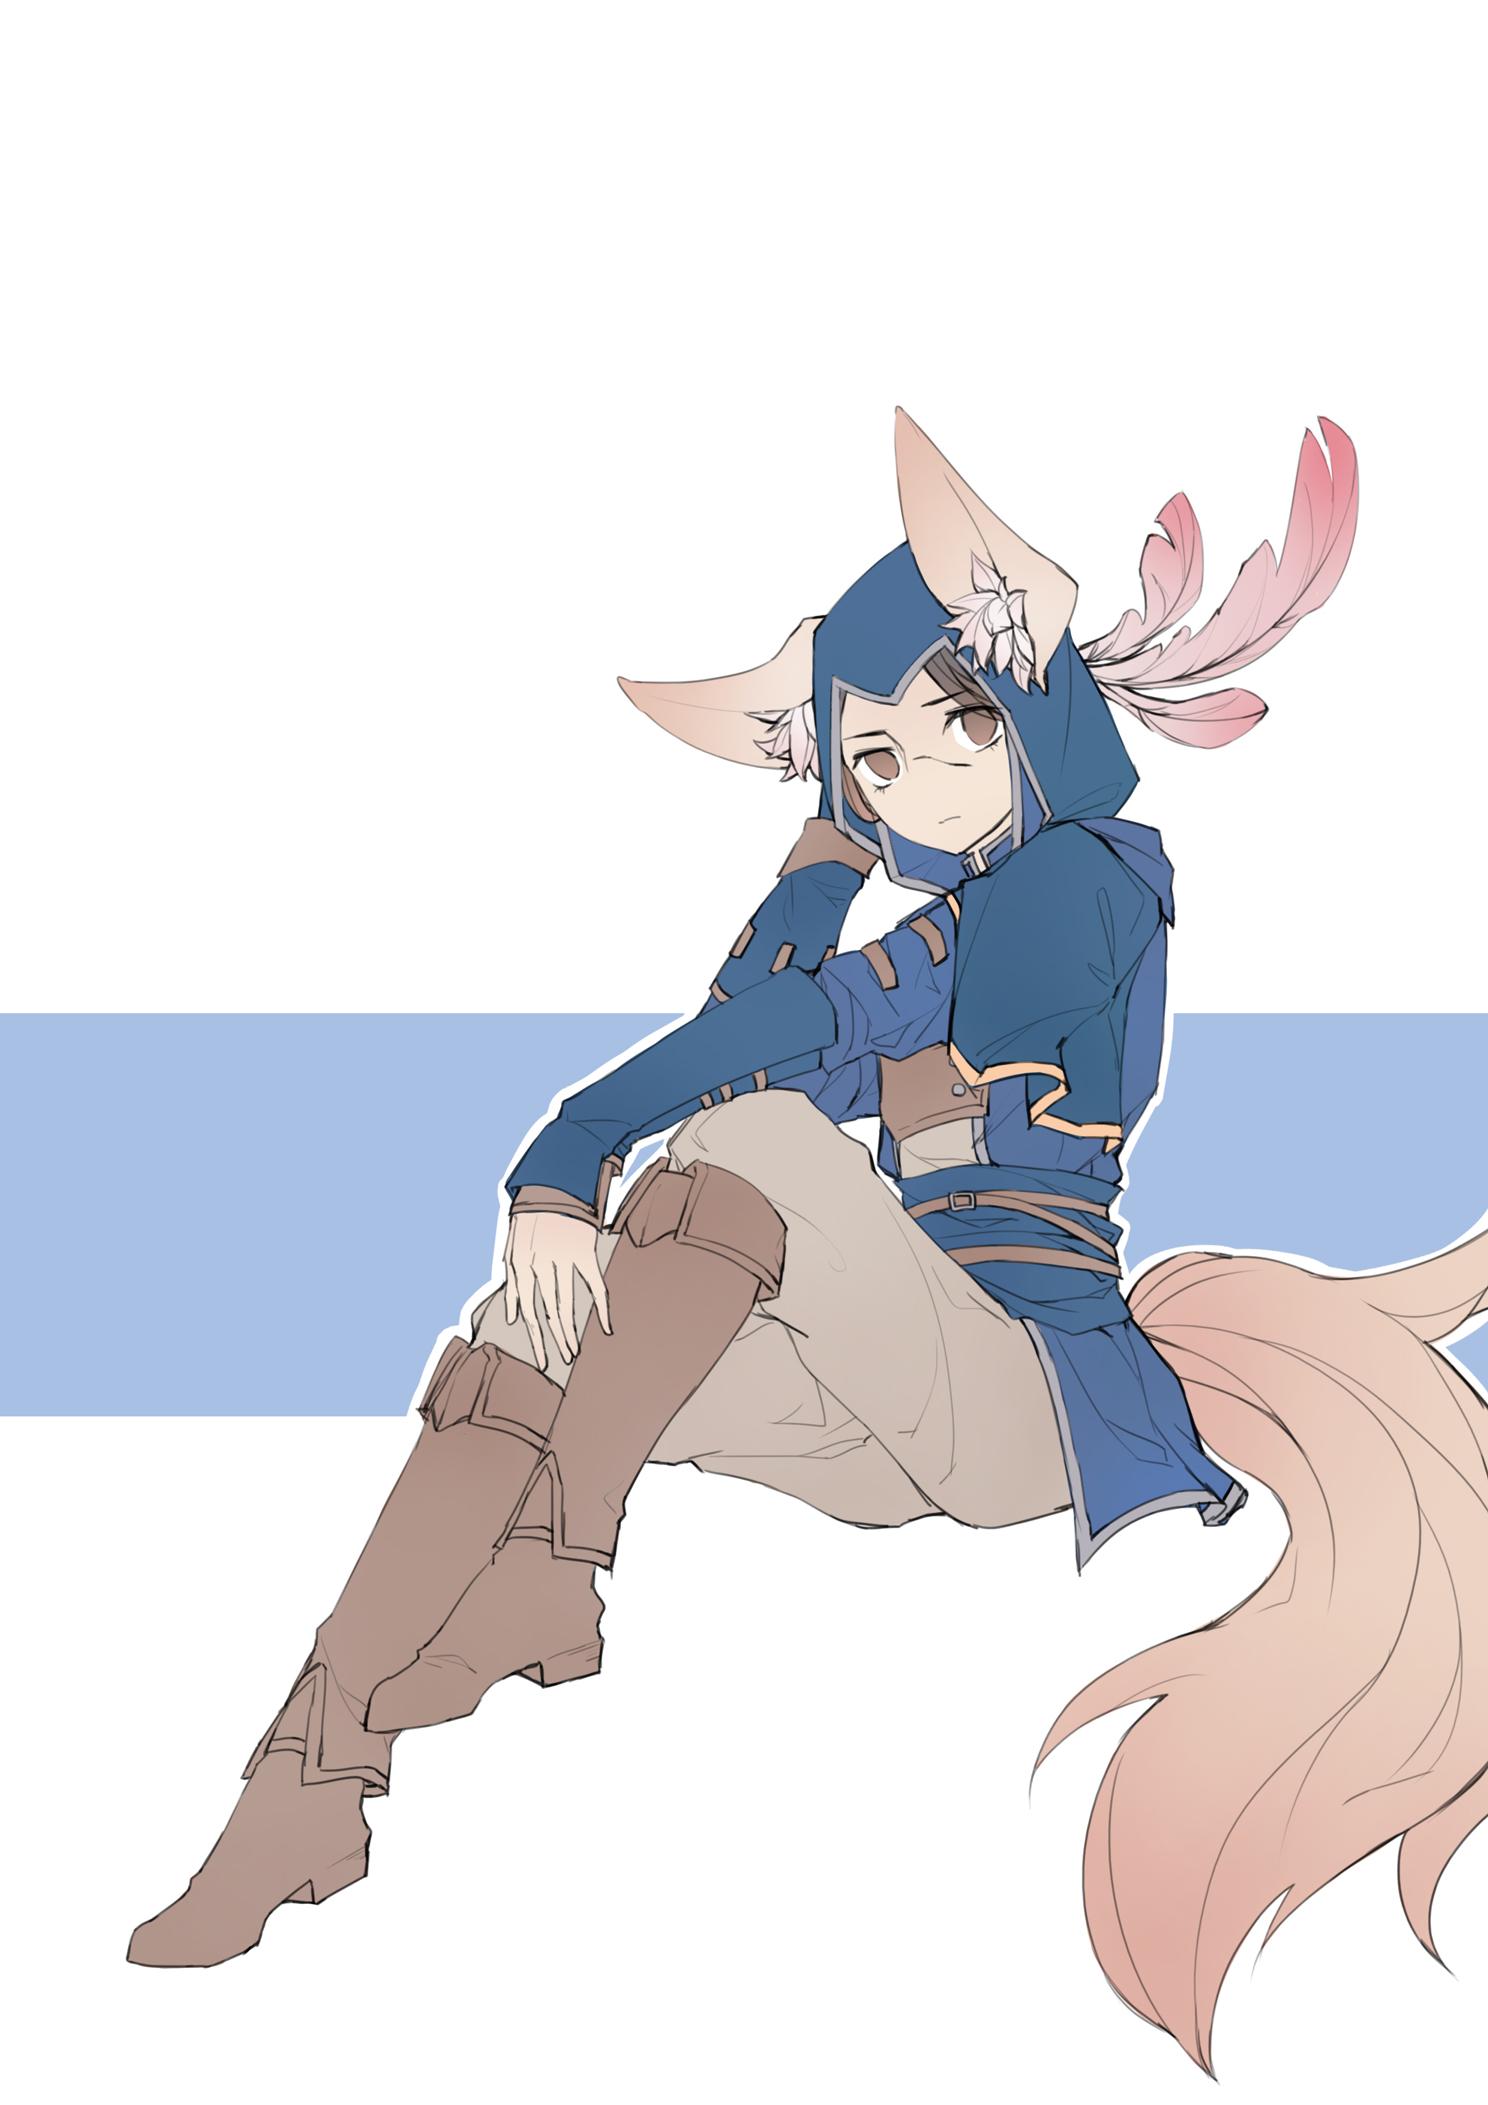 Anime Characters Unity : Arno dorian assassin s creed unity image